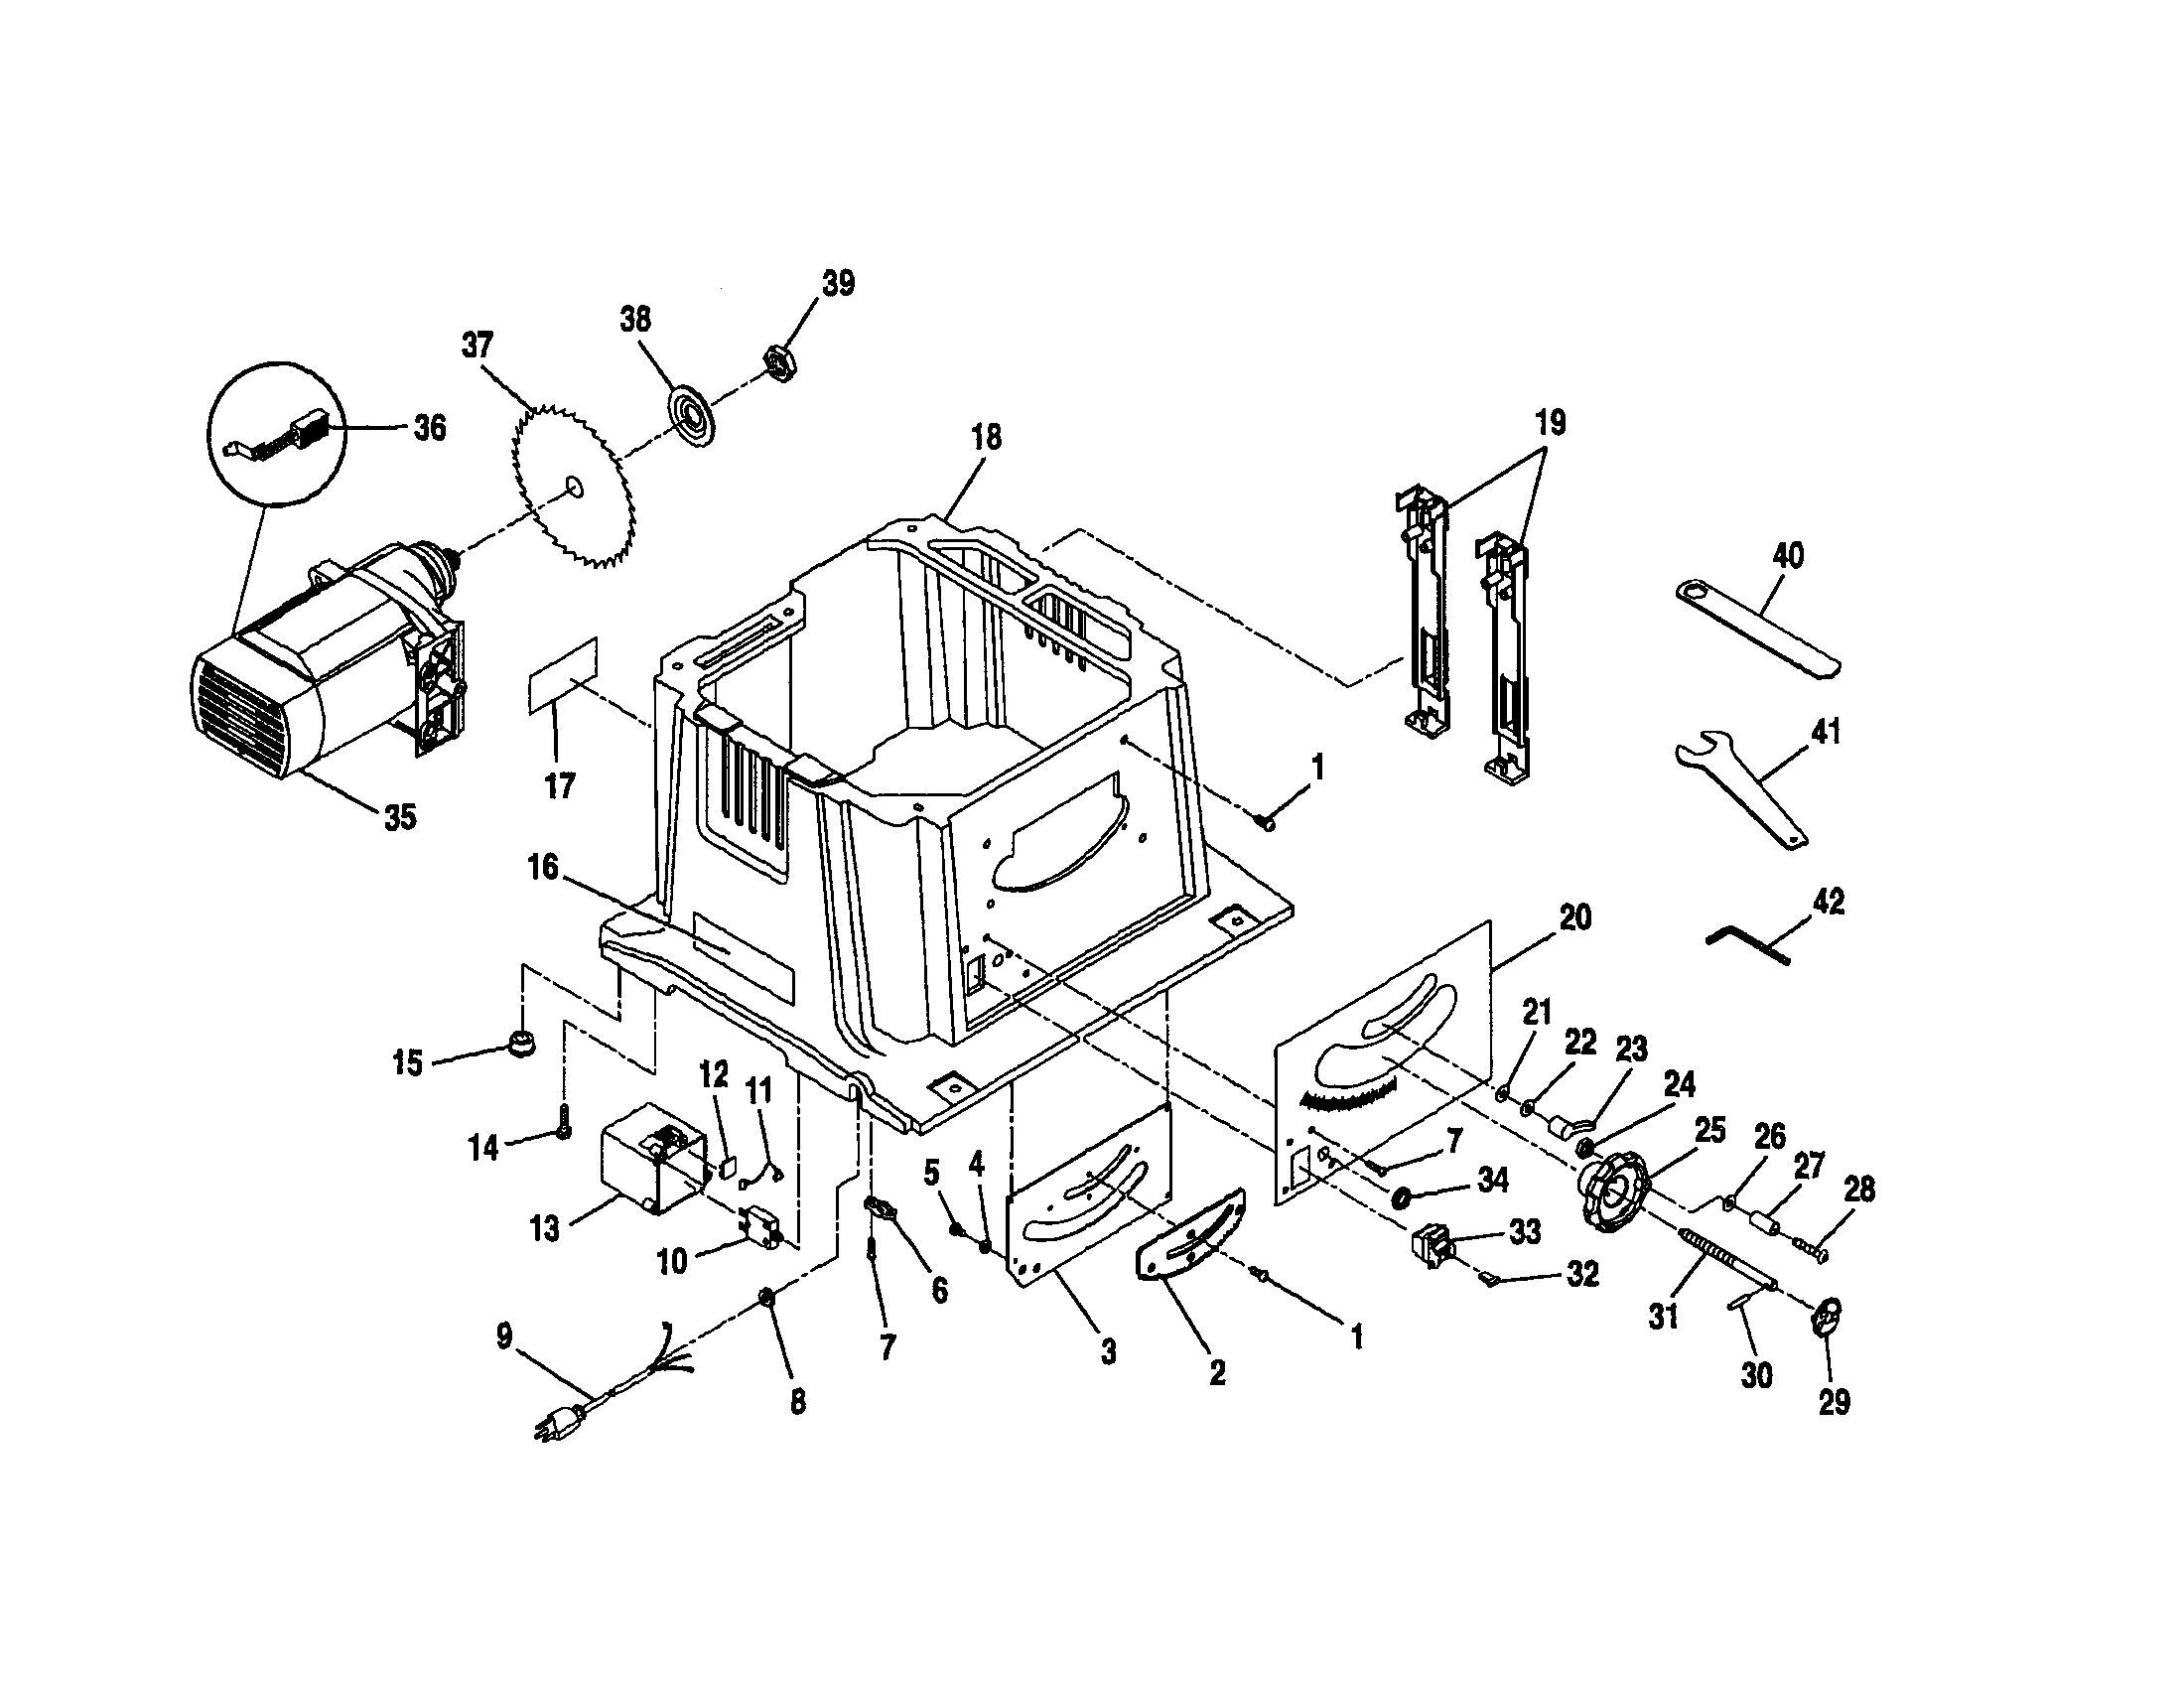 wiring diagram for ryobi table saw bts10 Wiring Diagram Fan